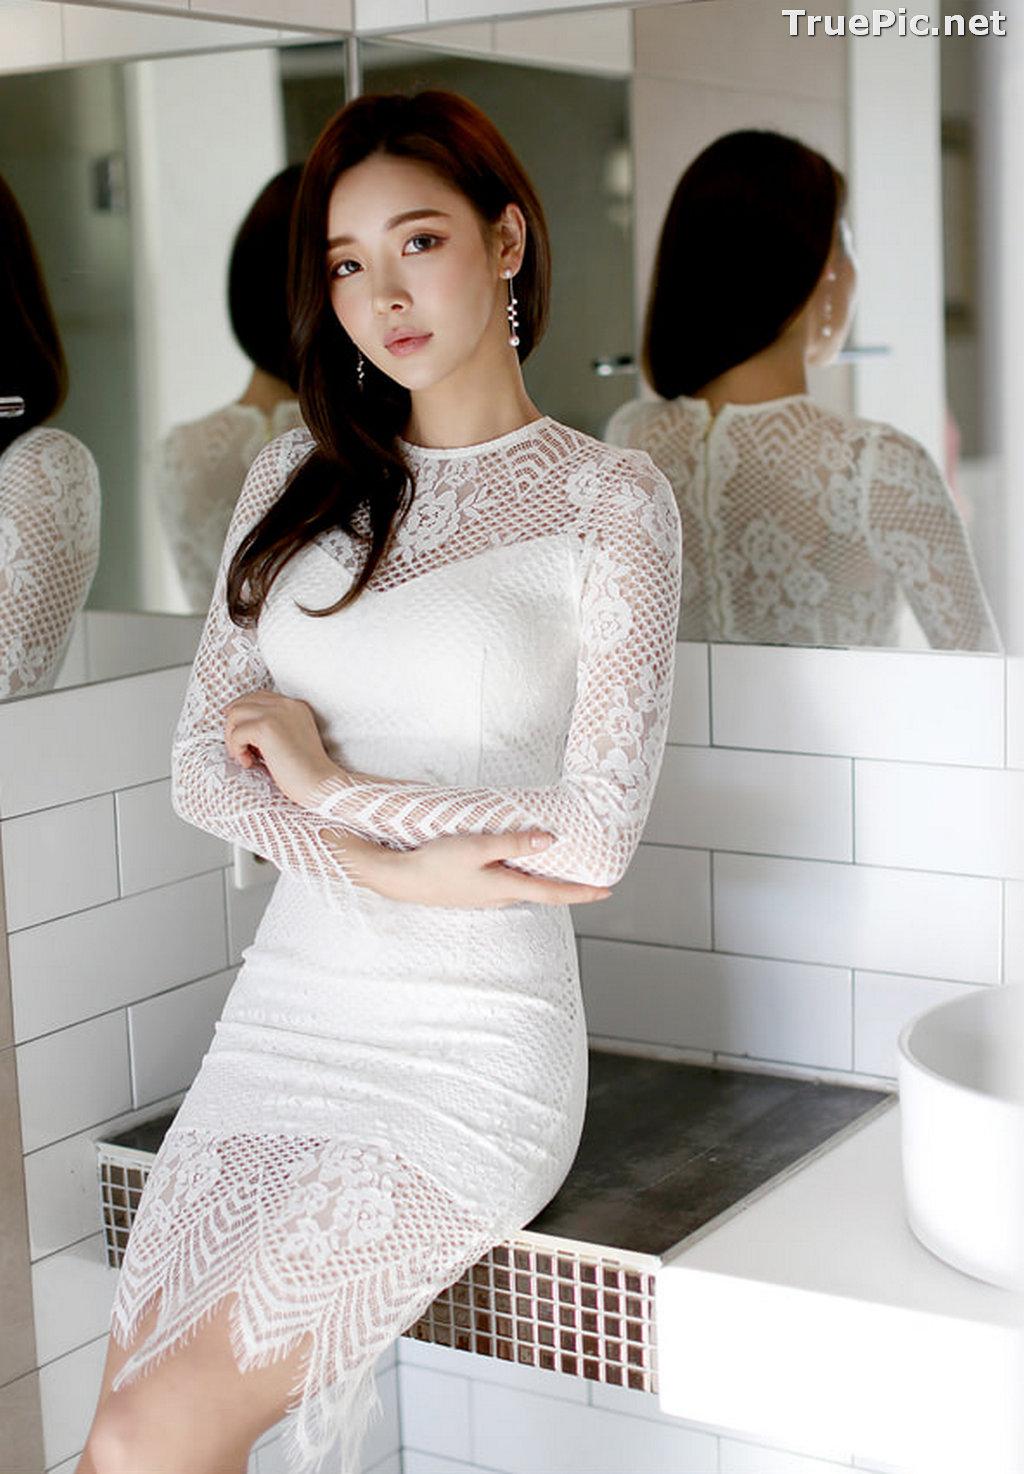 Image Korean Beautiful Model – Park Da Hyun – Fashion Photography #4 - TruePic.net - Picture-1